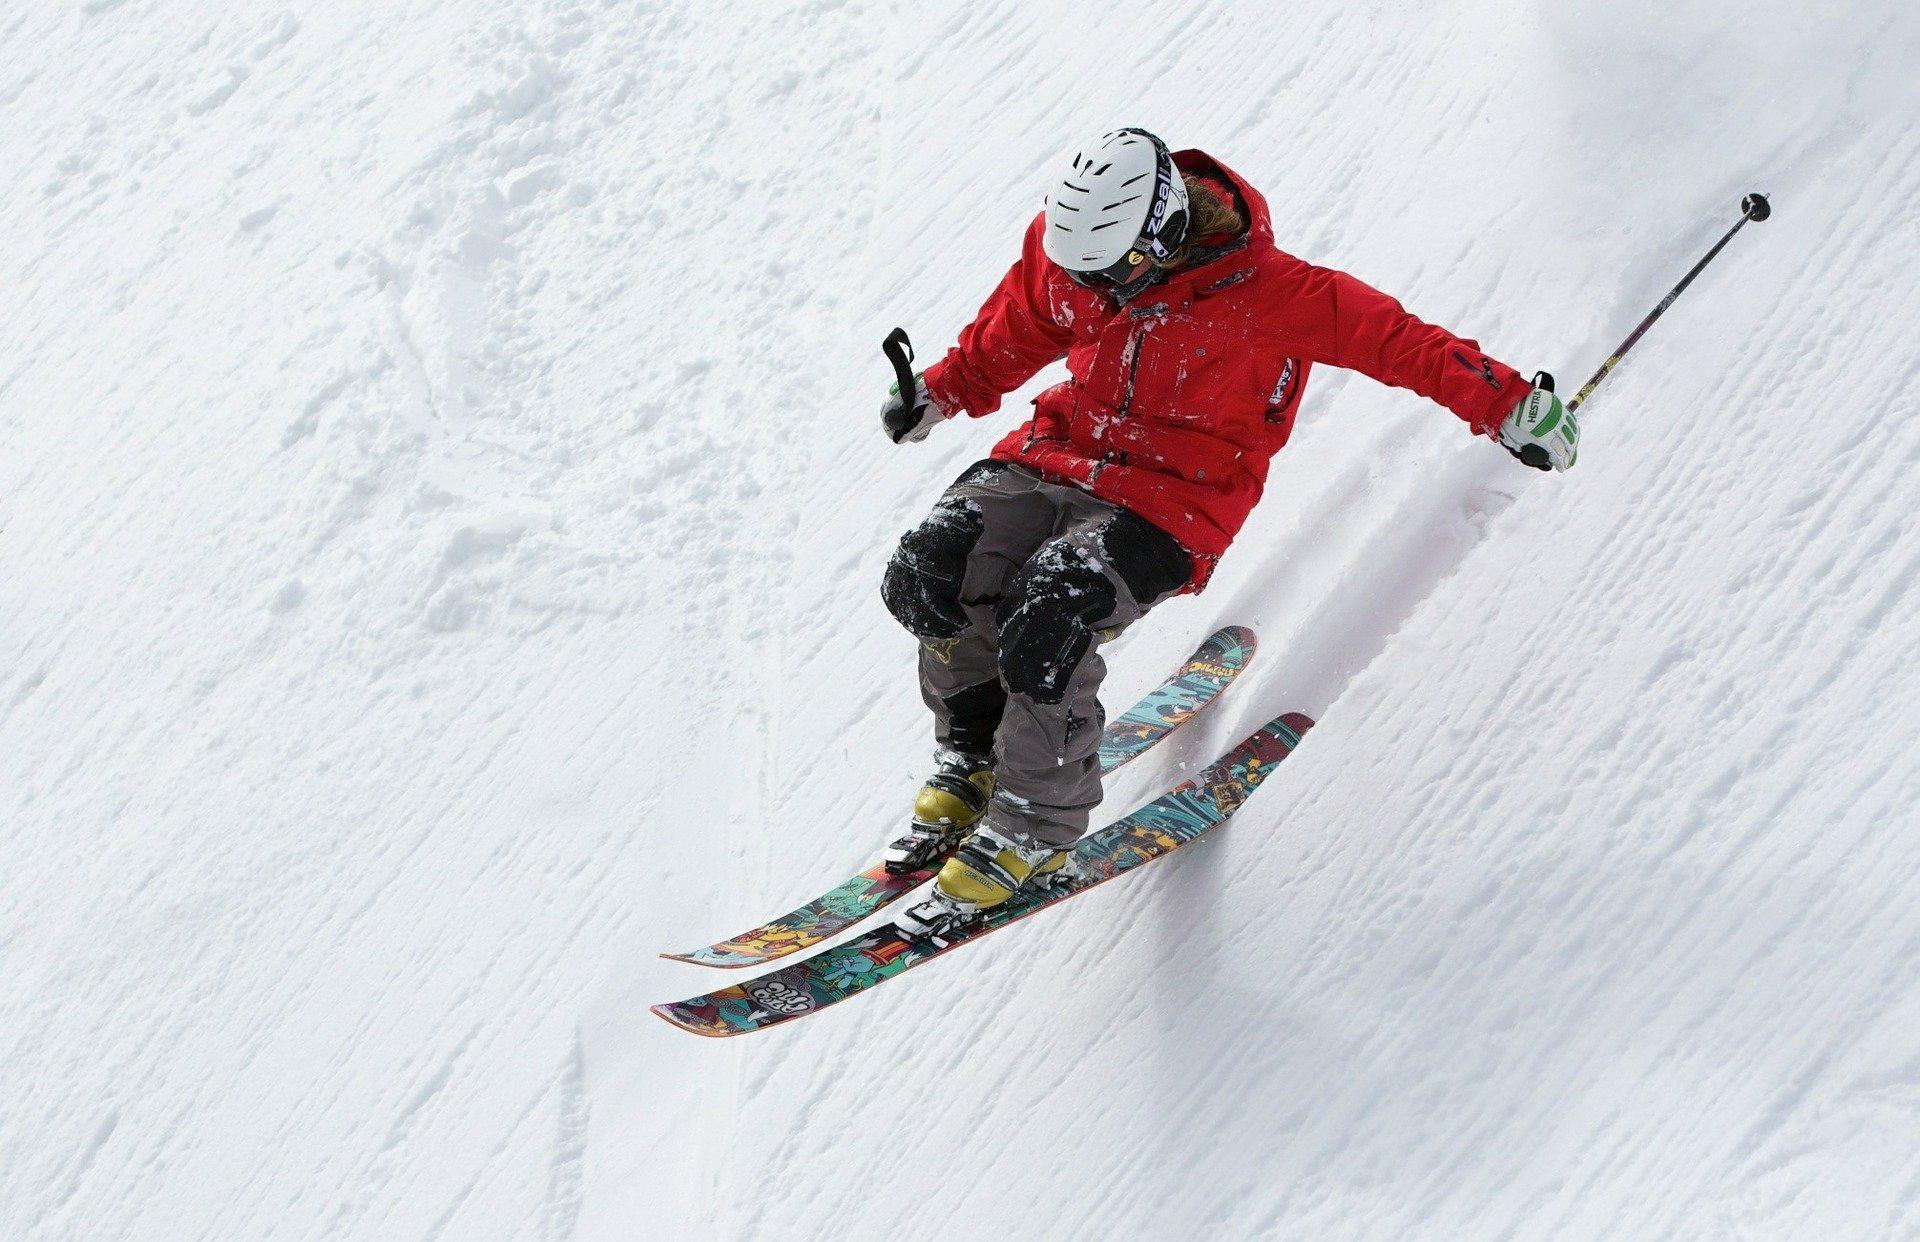 Sci snowboard freeride elisky